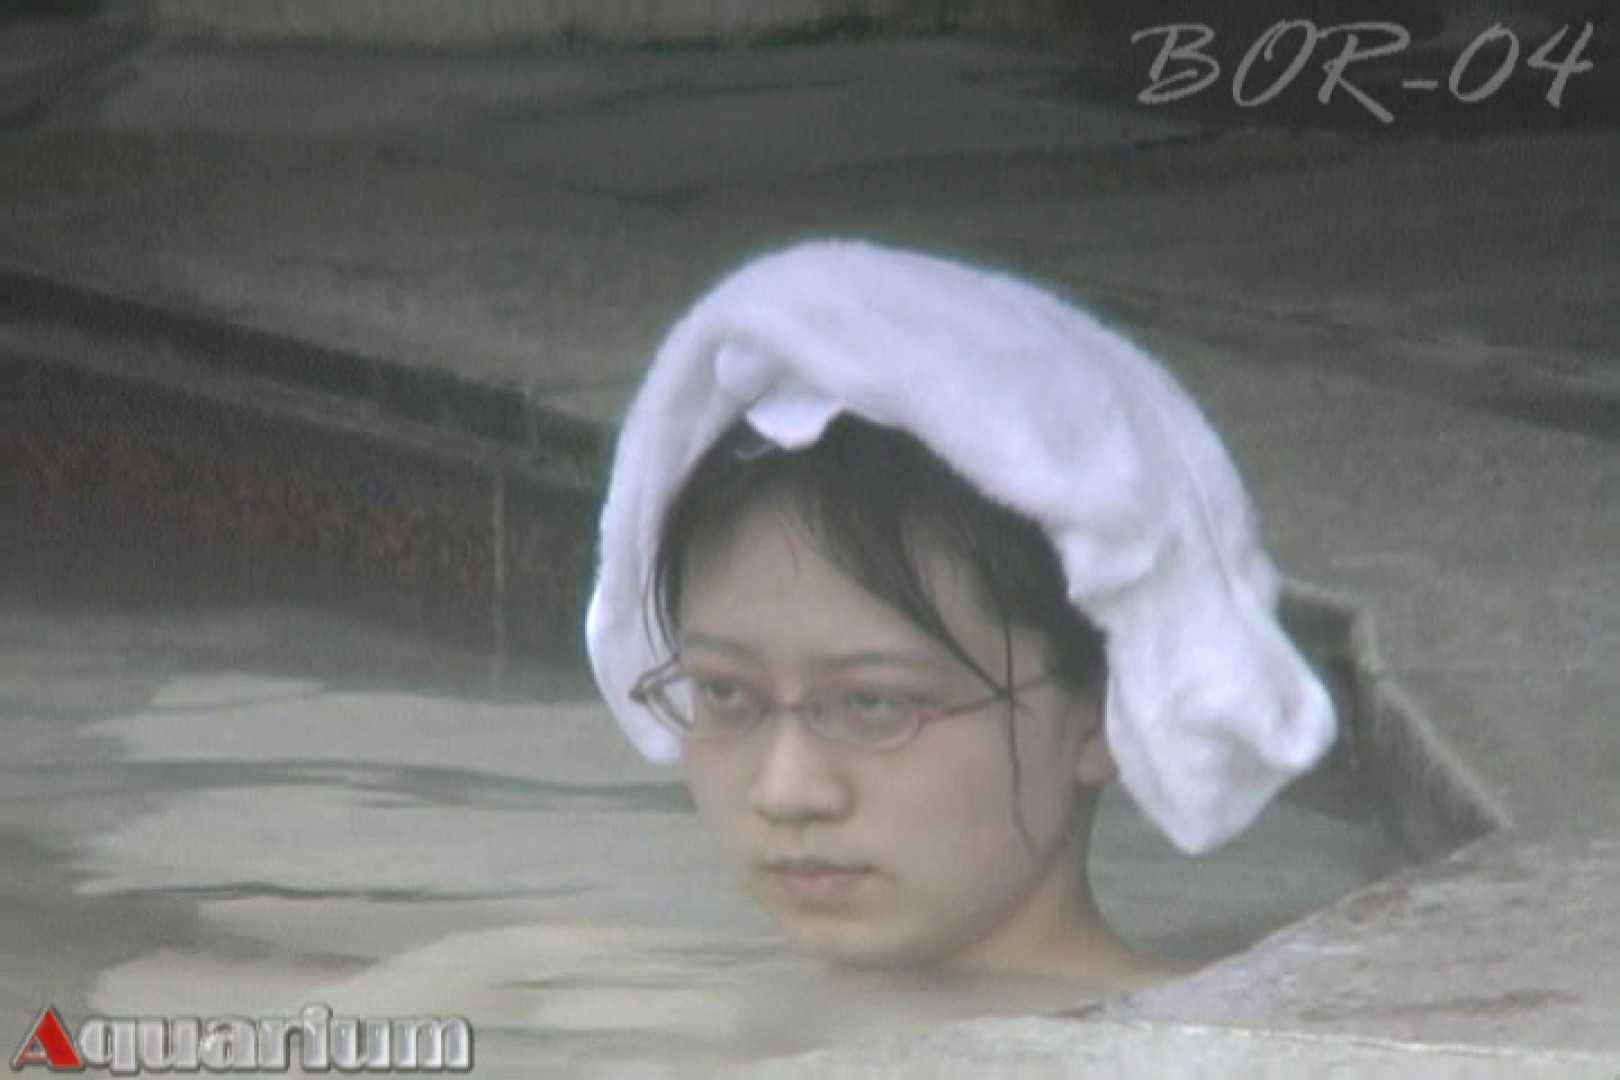 Aquaな露天風呂Vol.507 露天 ワレメ無修正動画無料 84画像 80